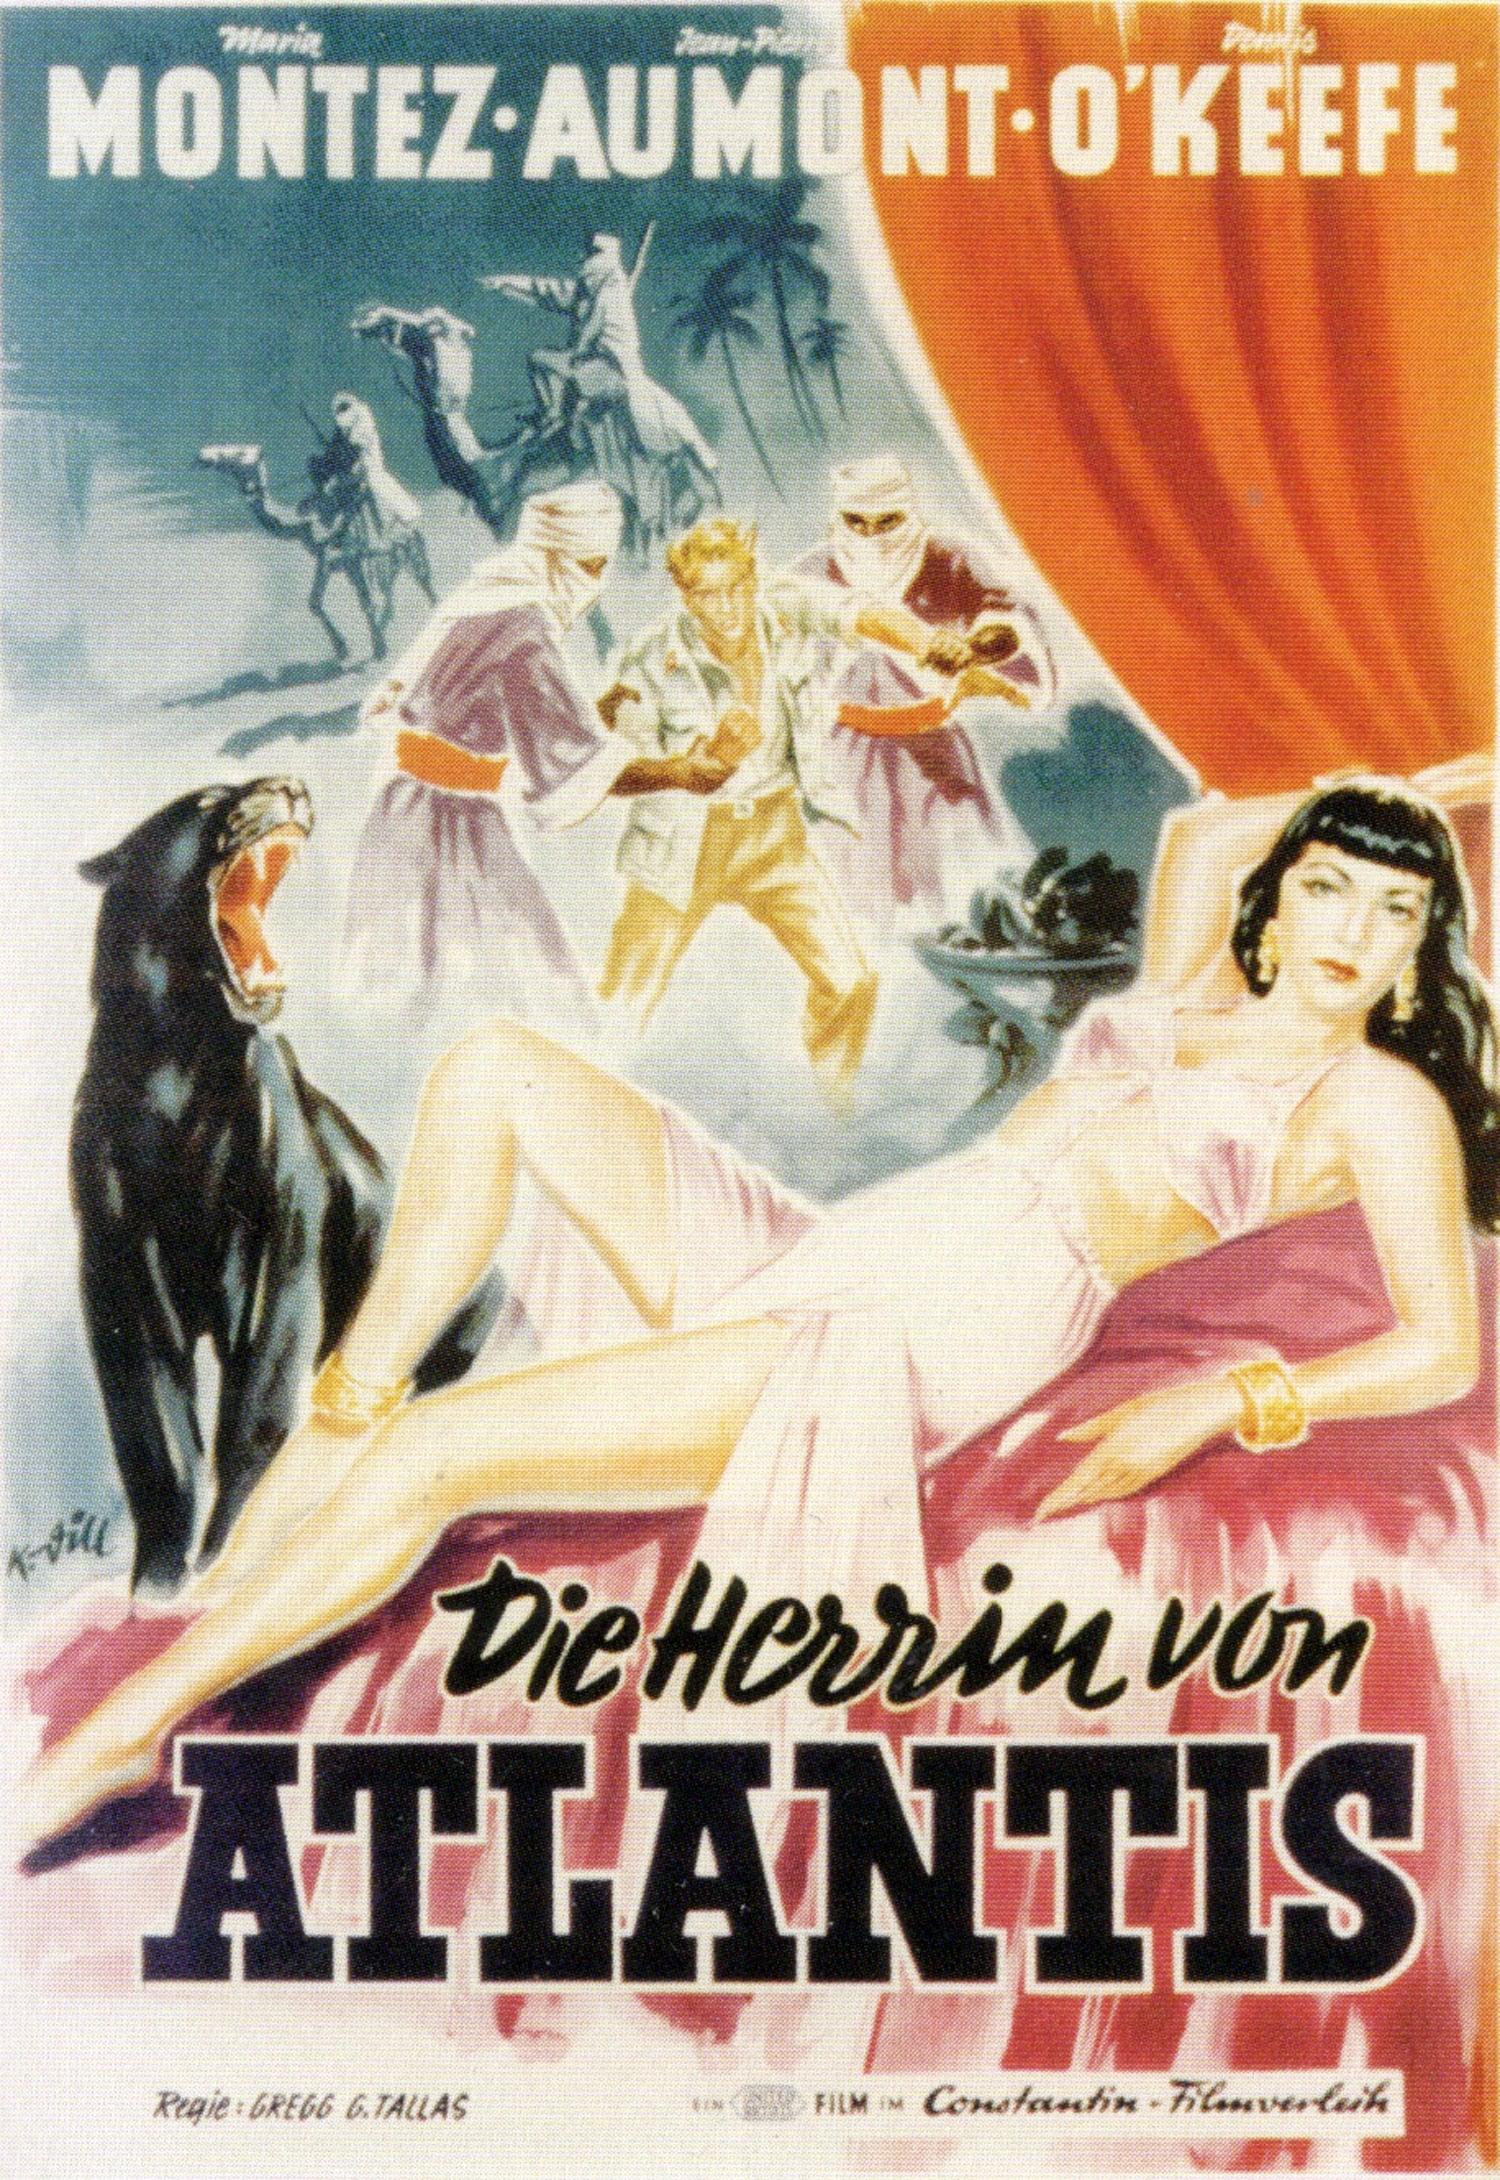 Siren of Atlantis (1949)